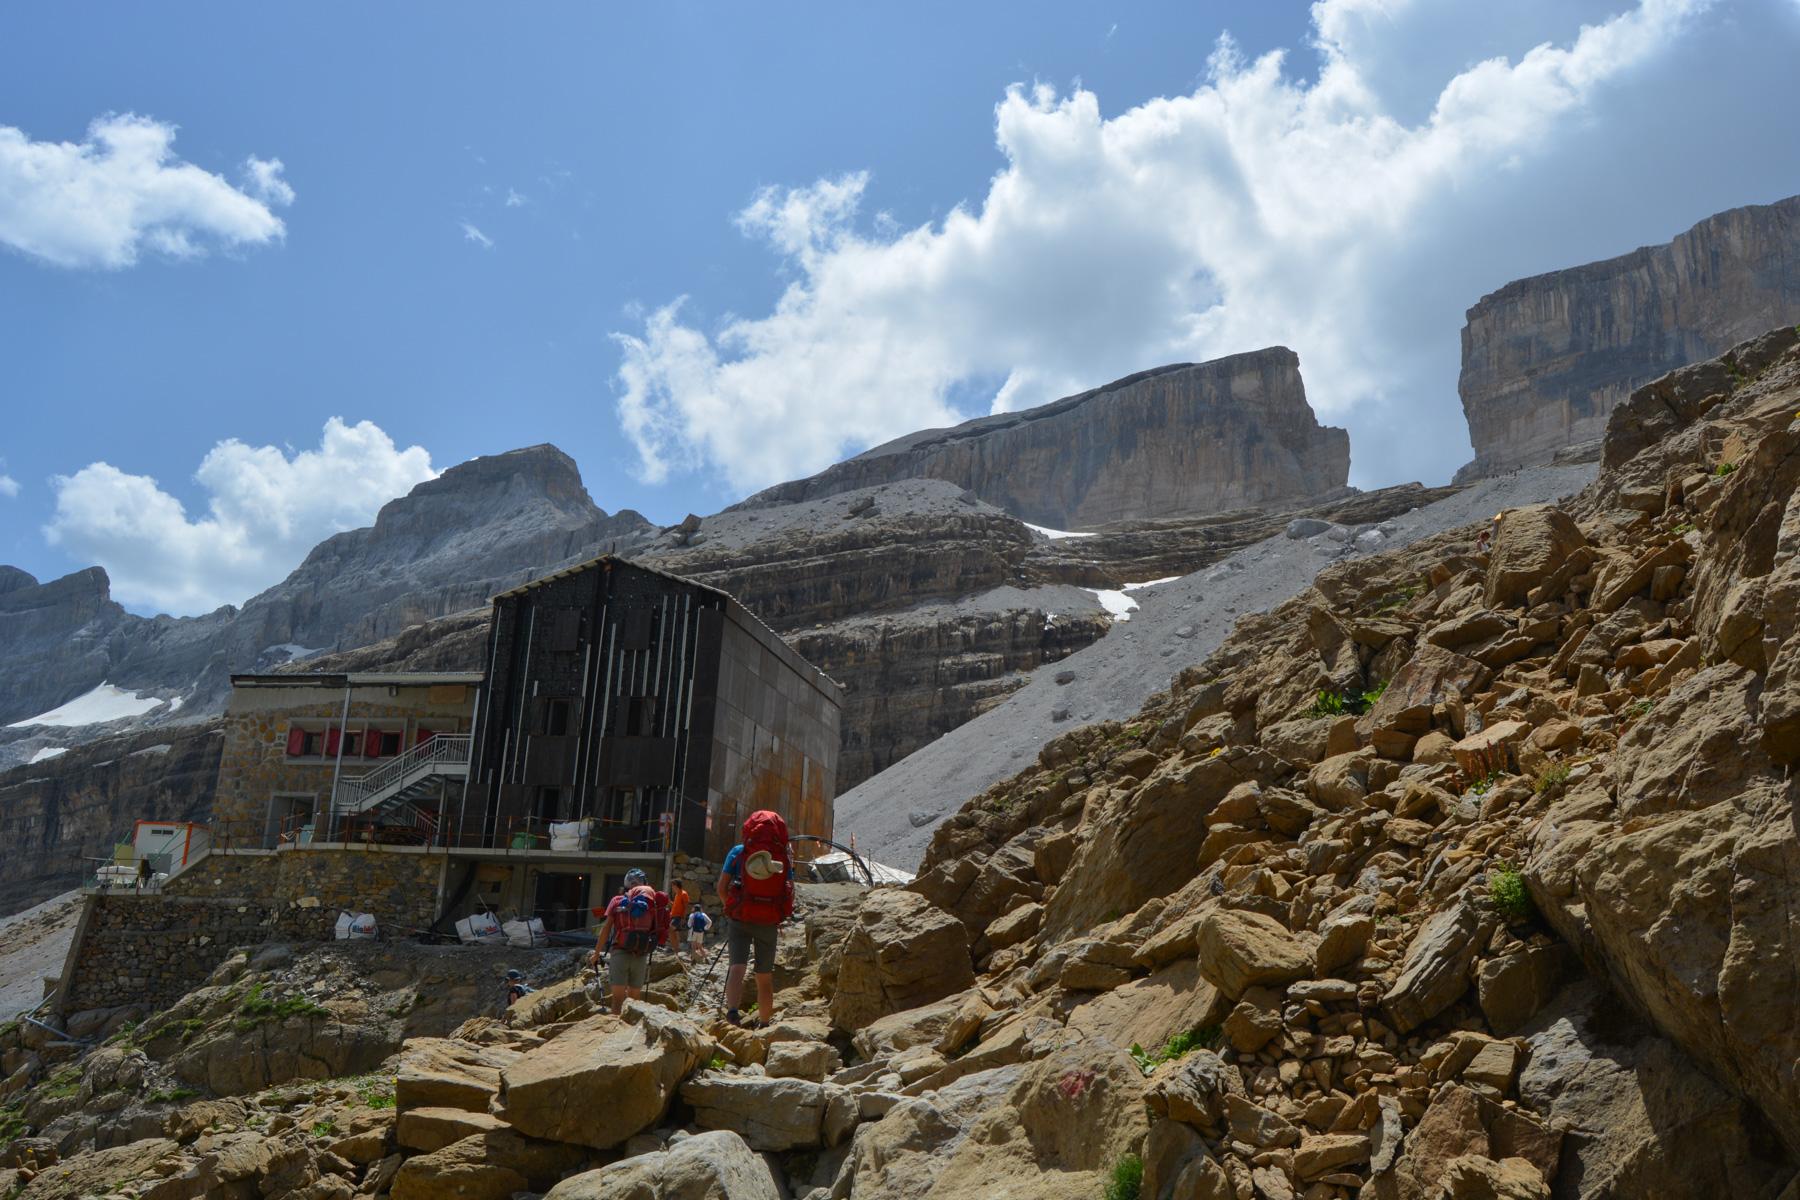 Monte Perdido et Faja de las Flores, Jour 1, Ordesa, Aragon, Espagne 15